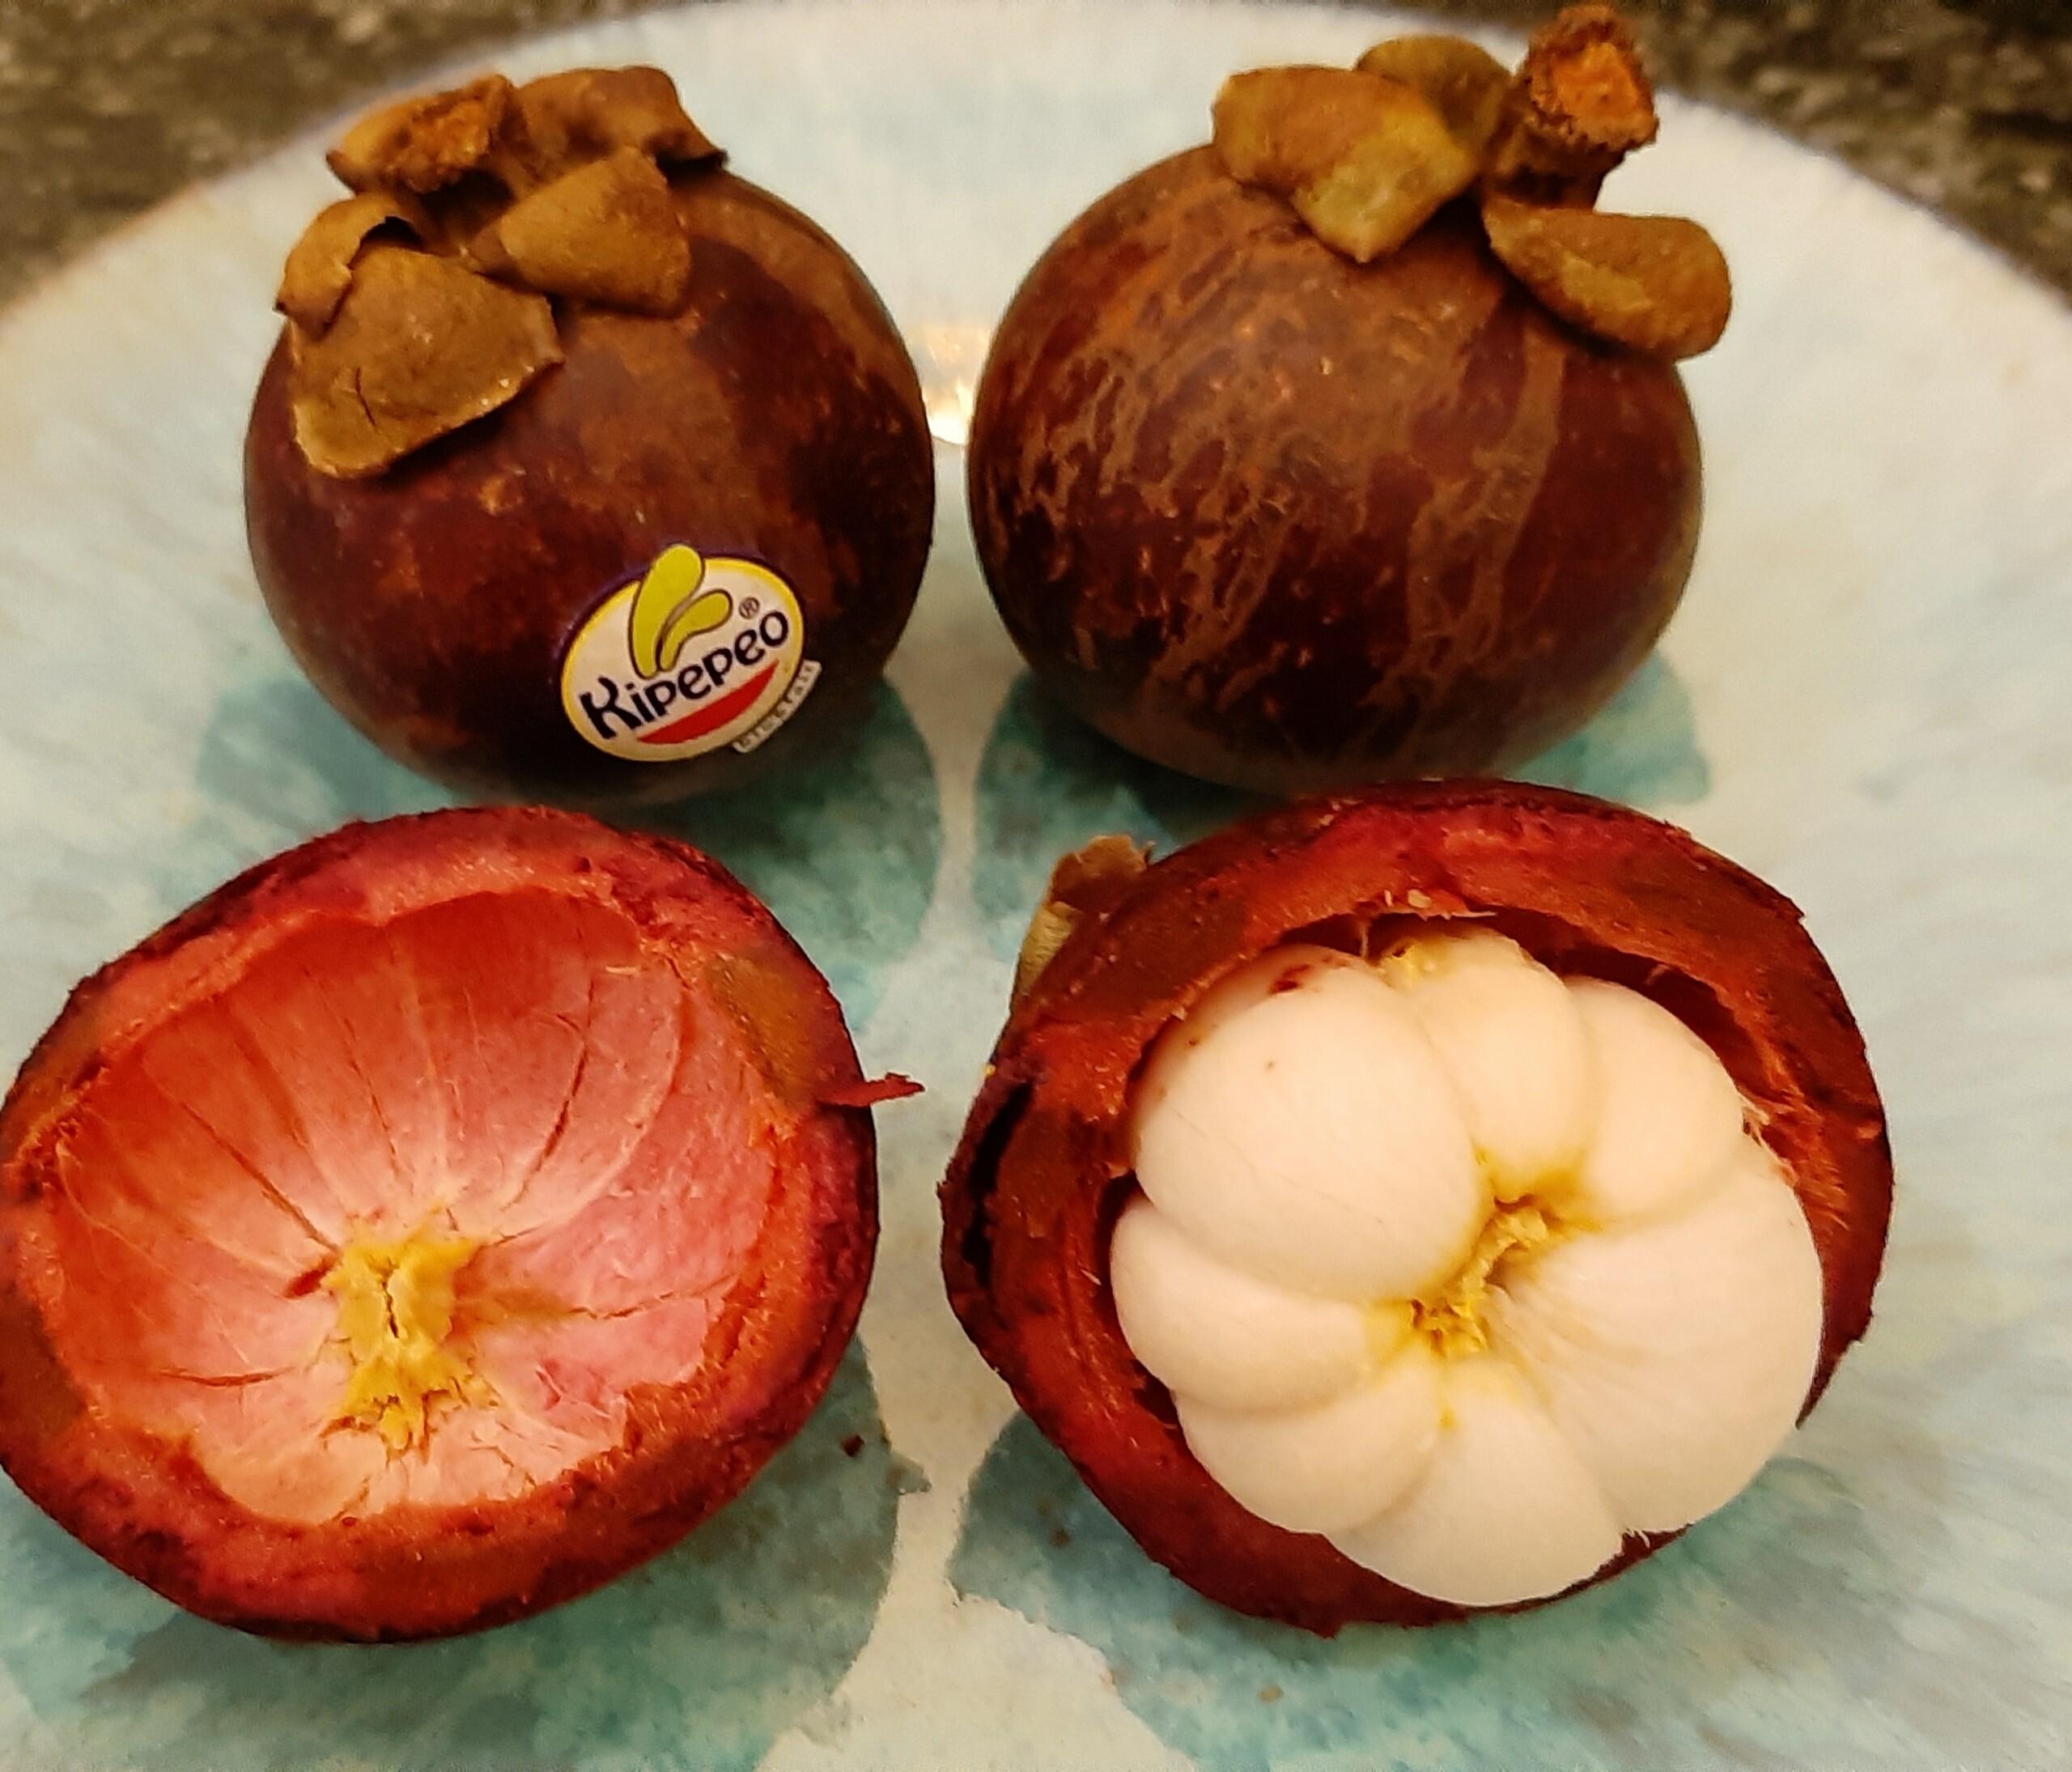 Mangostan - Bio-Obst Bio-Gemüse im Biogeschäft Biodelikat Bad Tölz